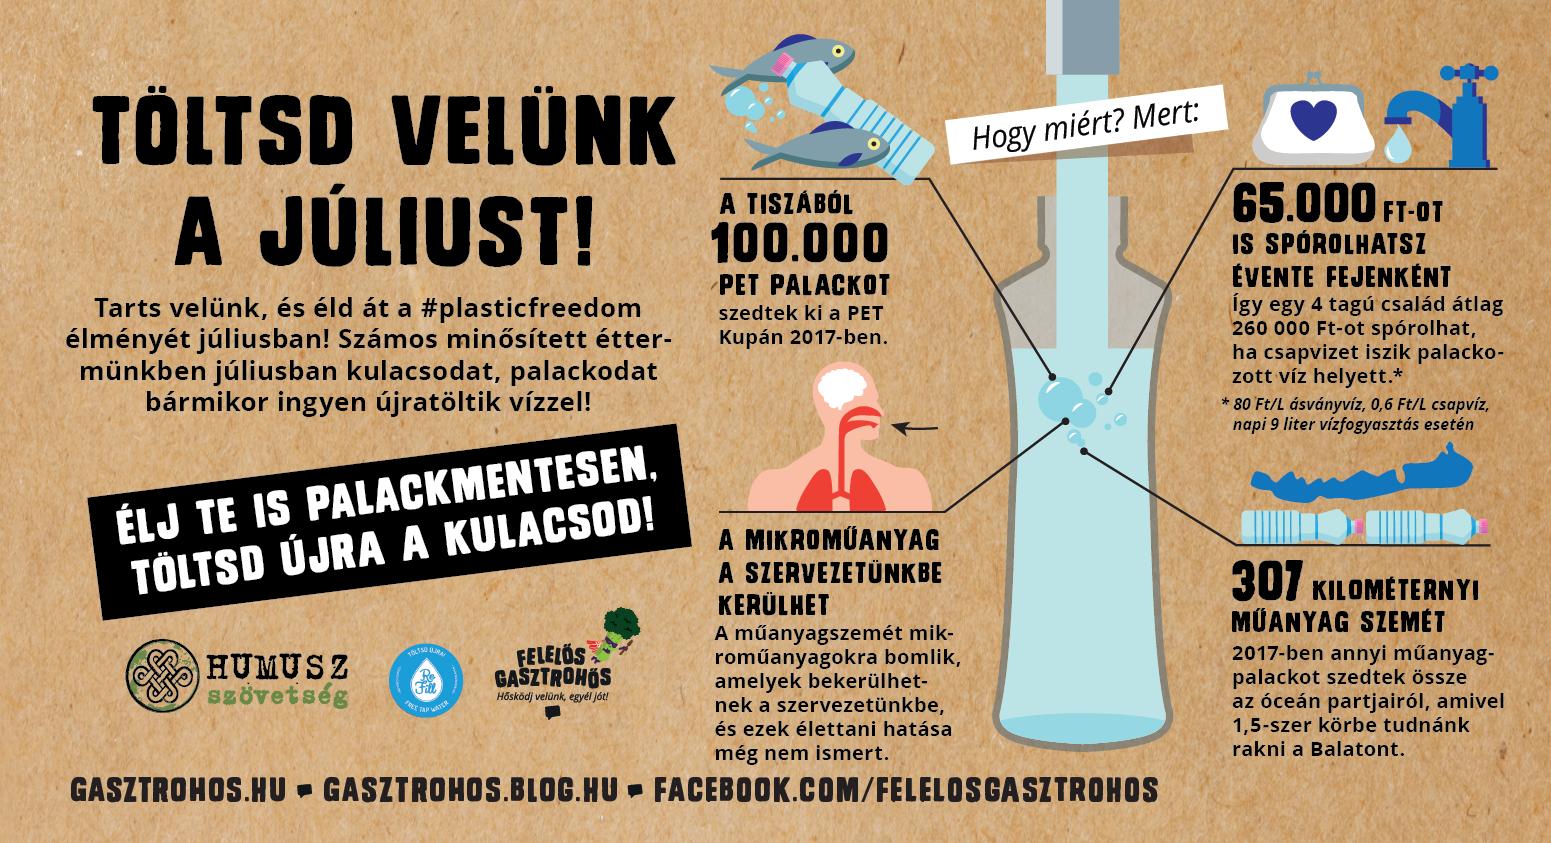 felelos-gasztrohos-toltsd-velunk-a-juliust-2018-06-20_esemeny-cover.png